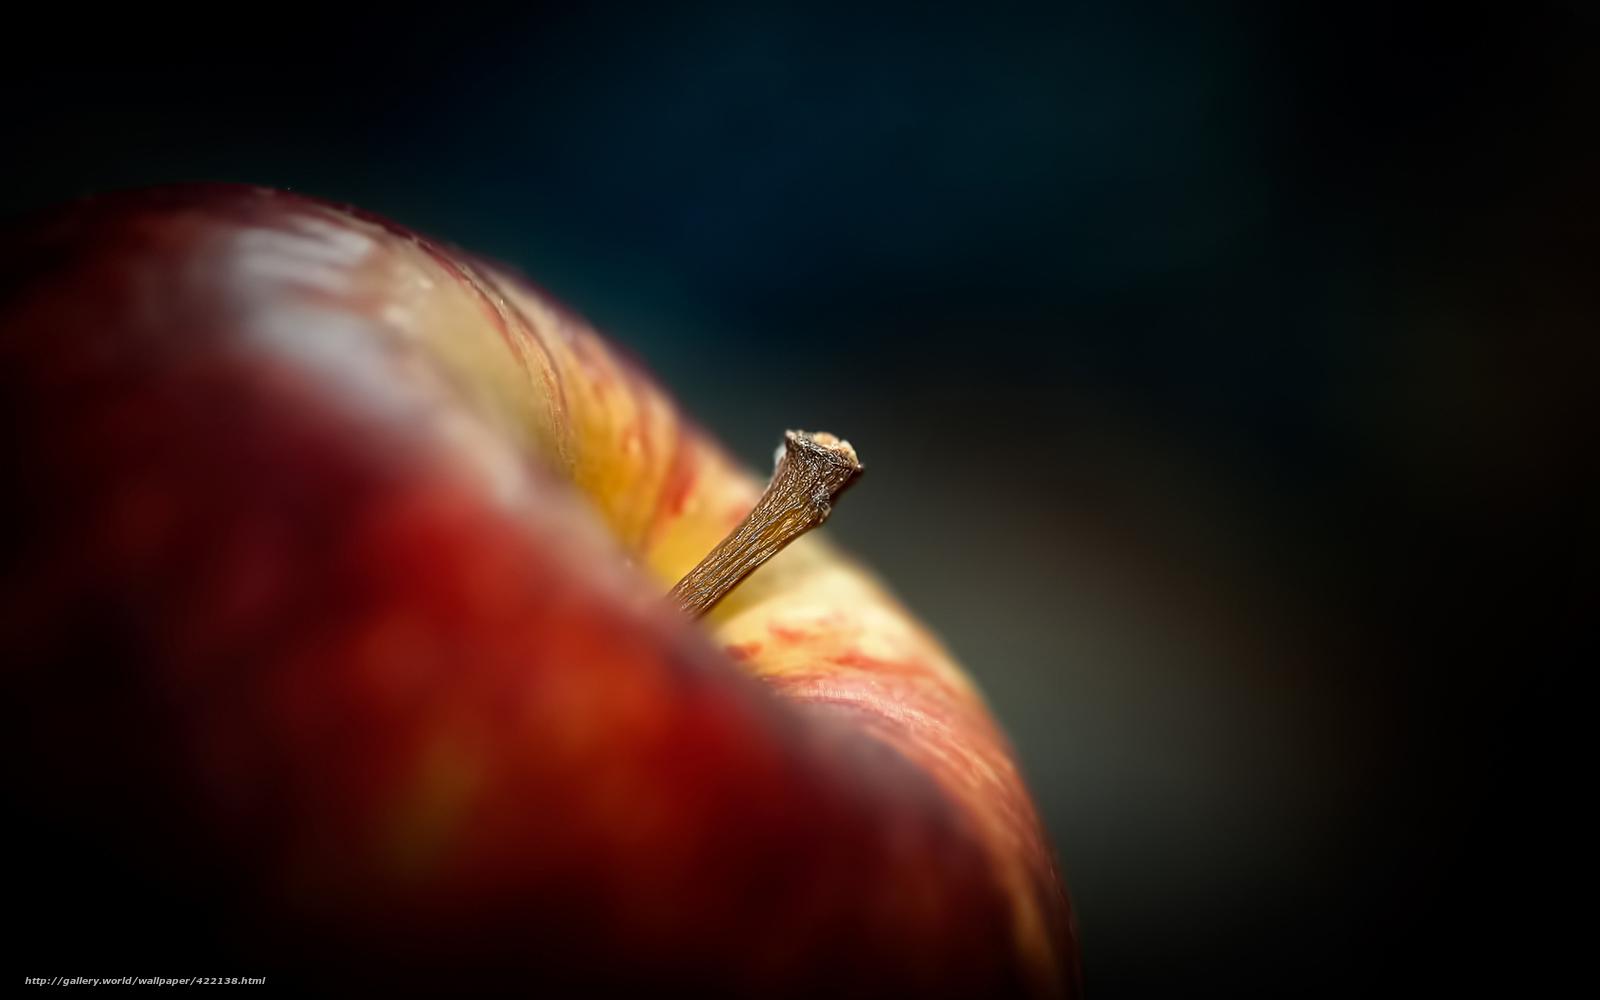 Tlcharger fond d 39 ecran pomme queue fond noir fonds d for Bureau fond d ecran